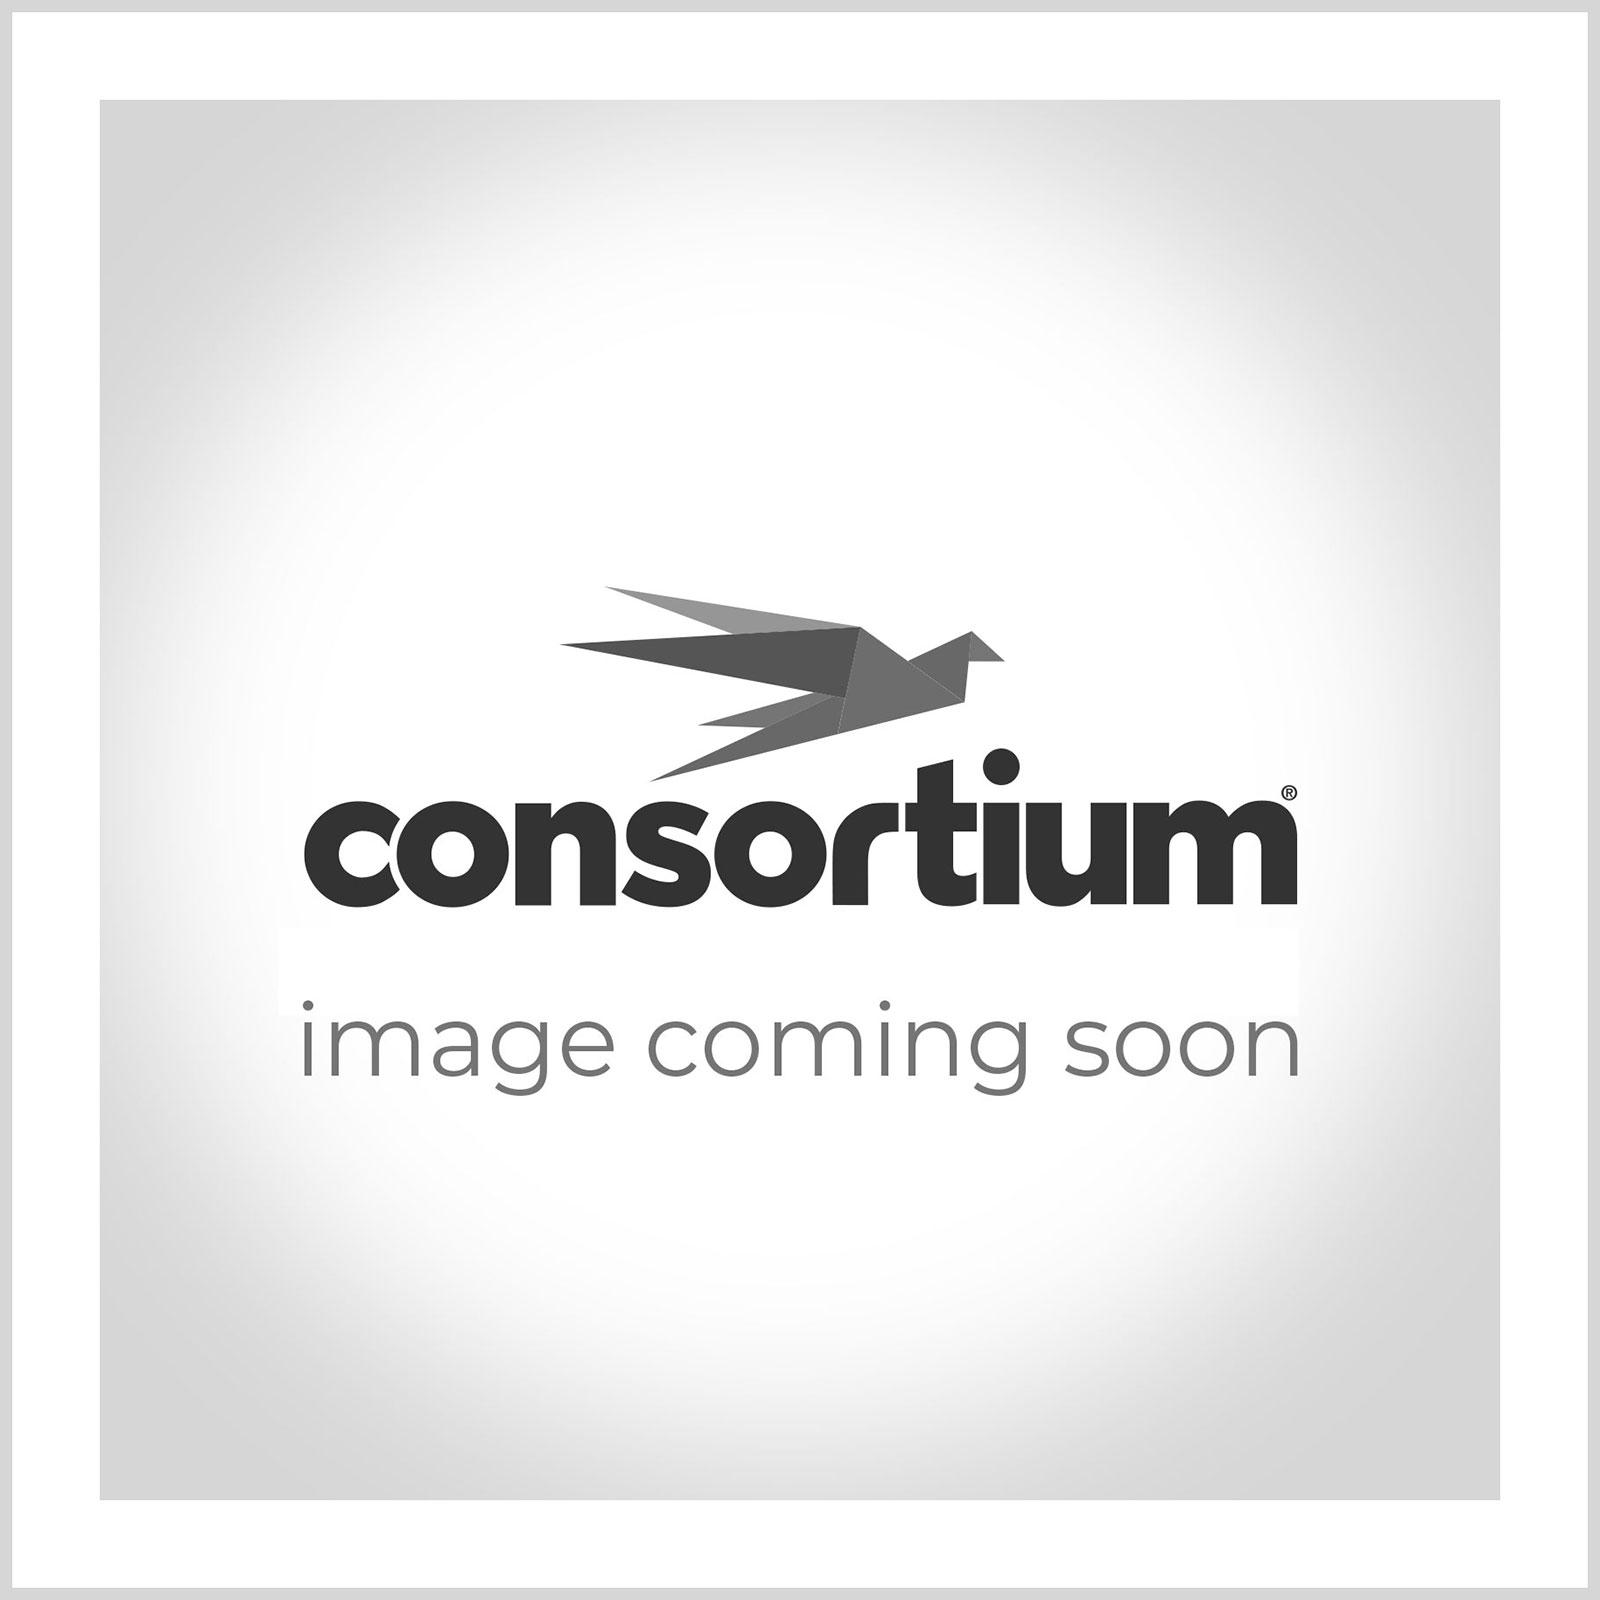 Non-Vending Plastic Cups